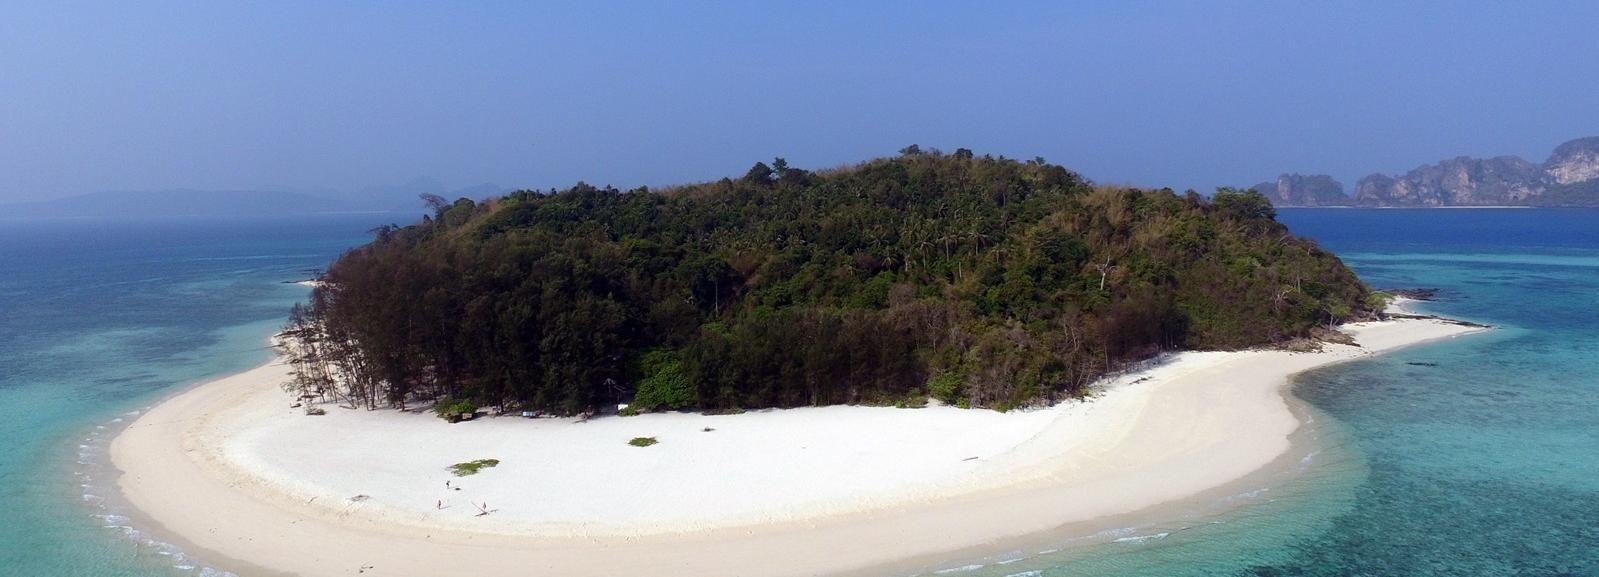 Tour de 1 día a las islas Phi Phi con esnórquel desde Phuket